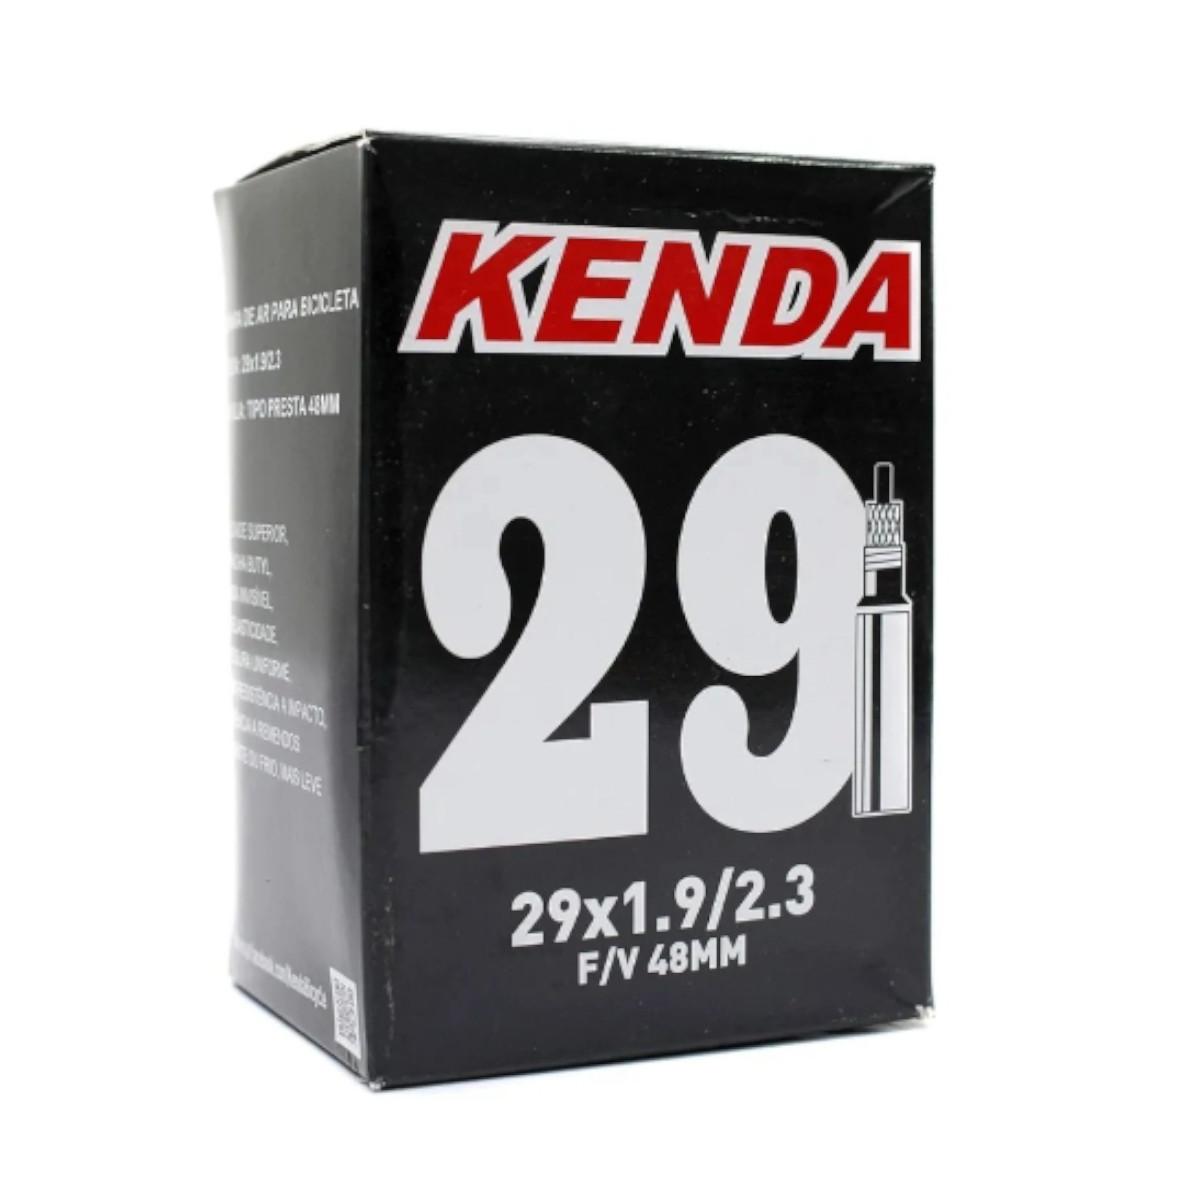 Câmara de Ar Kenda MTB 29 x 1.9 - 2.3 Válvula Presta 48mm